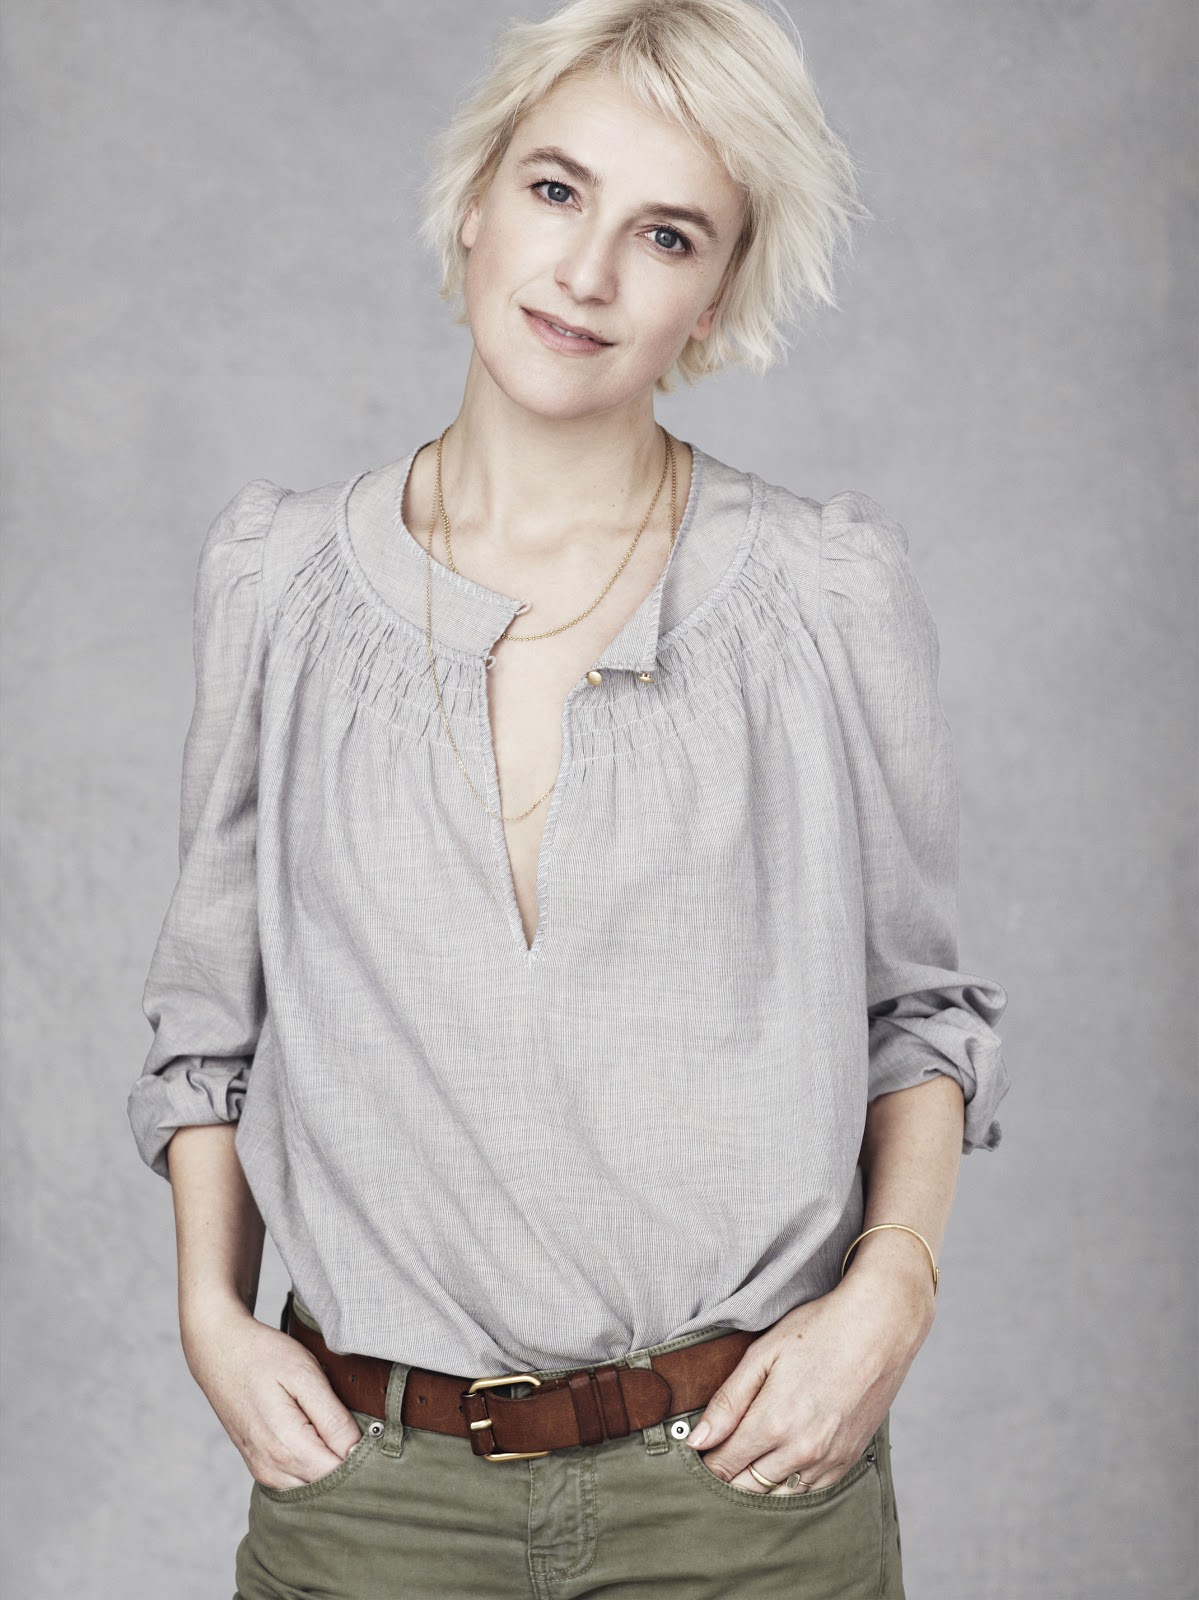 portrait-vanessa-bruno